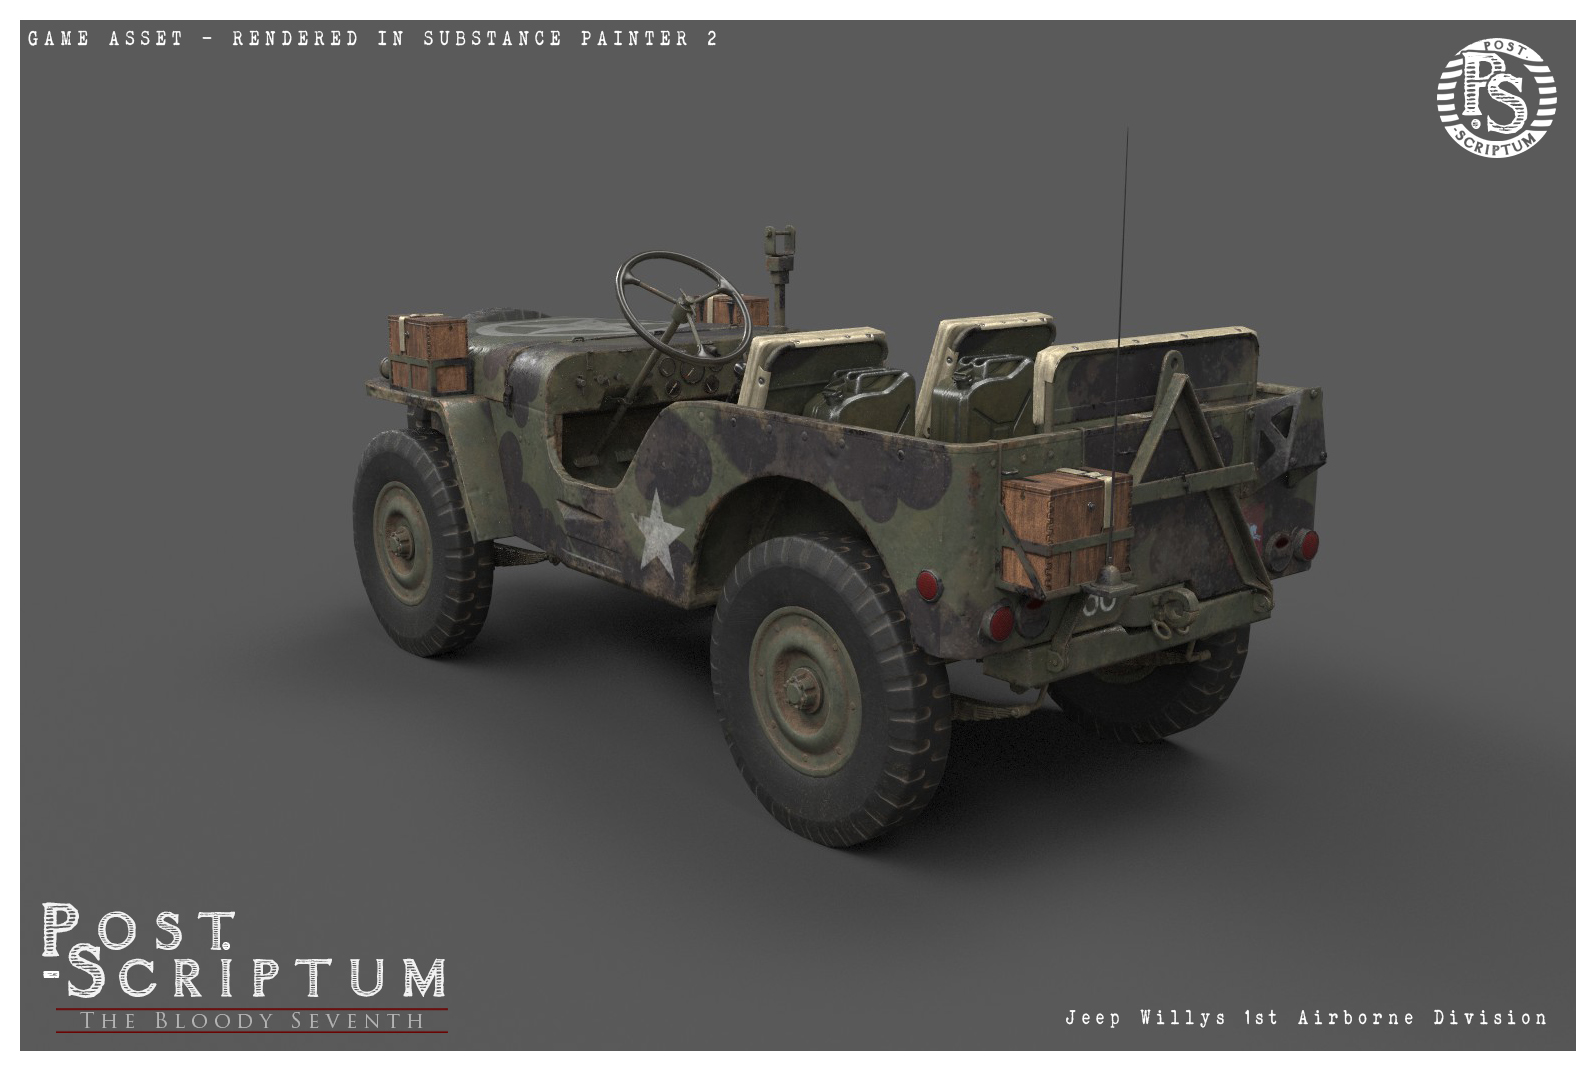 Jeep_Willys_1stAirborne_Studio_02.jpg